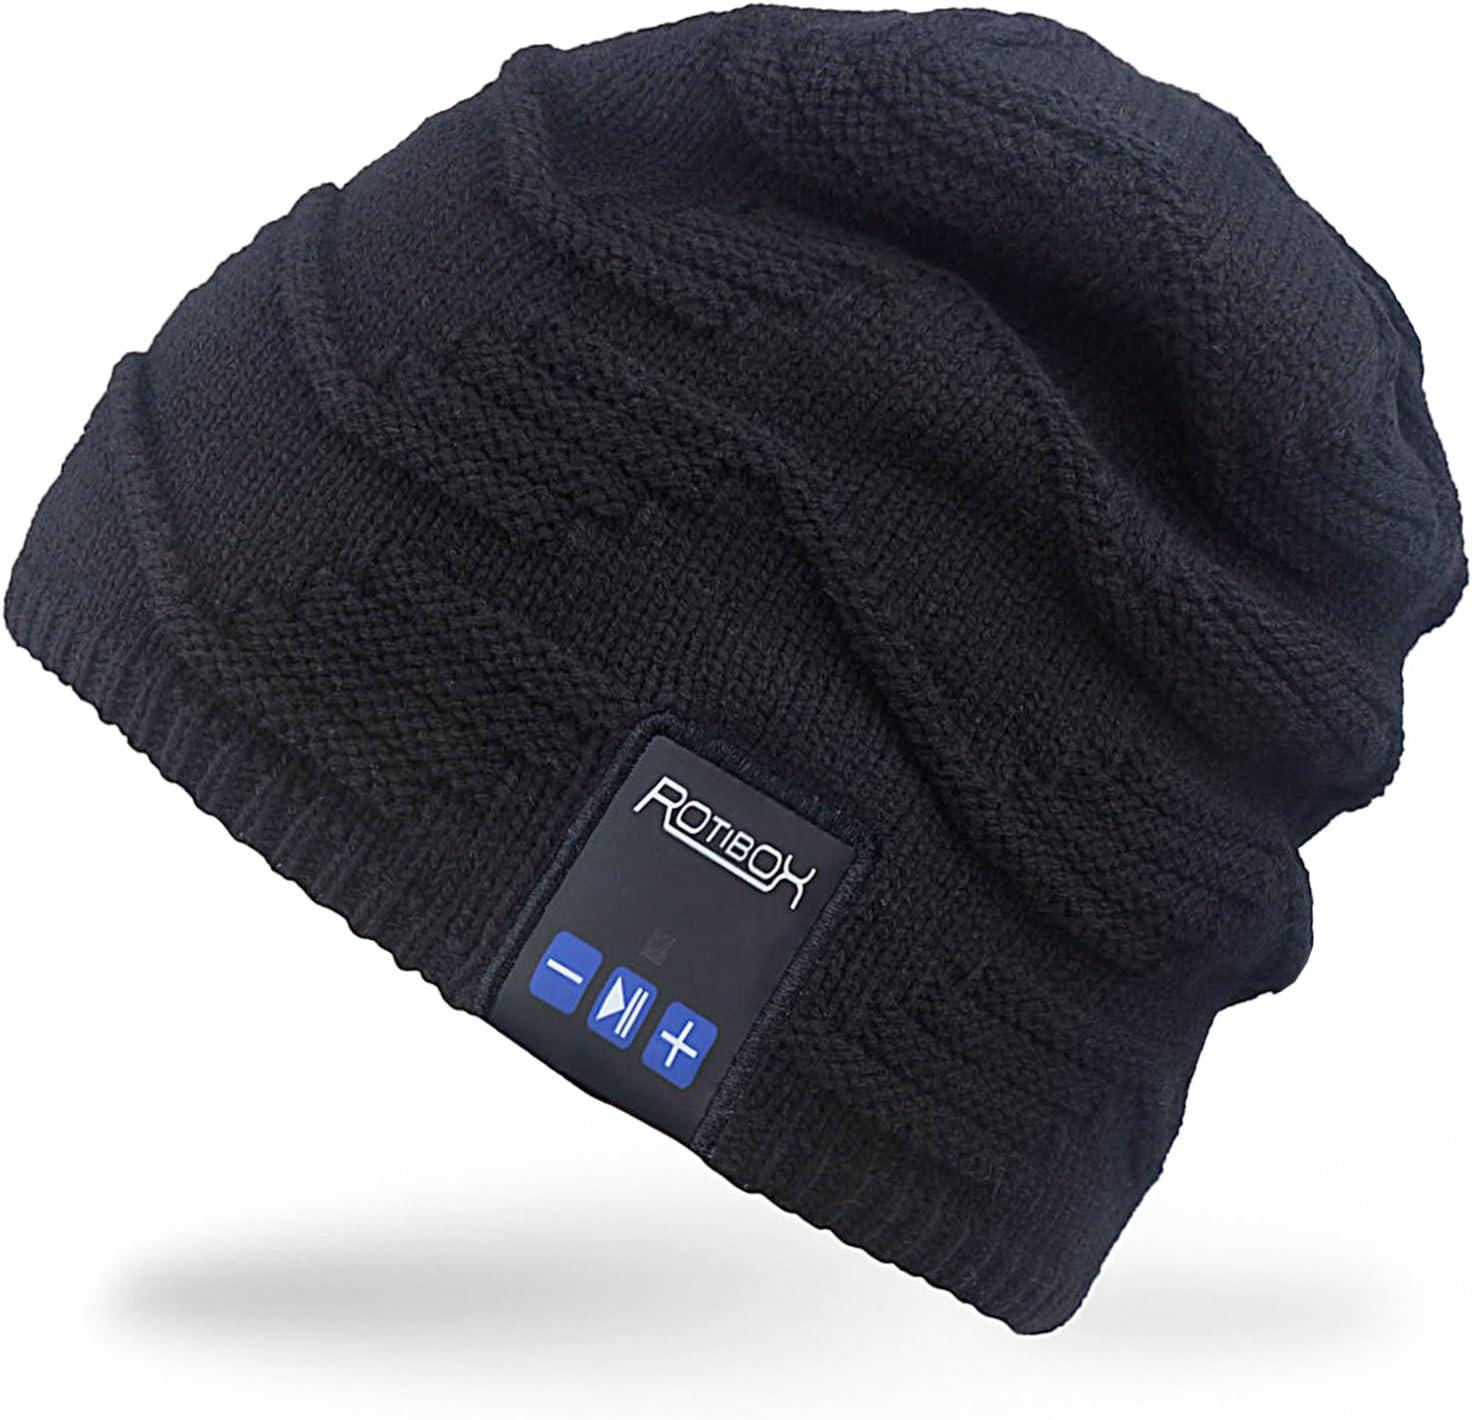 Al aire libre Rotibox Bluetooth Beanie Hat: Amazon.es: Electrónica